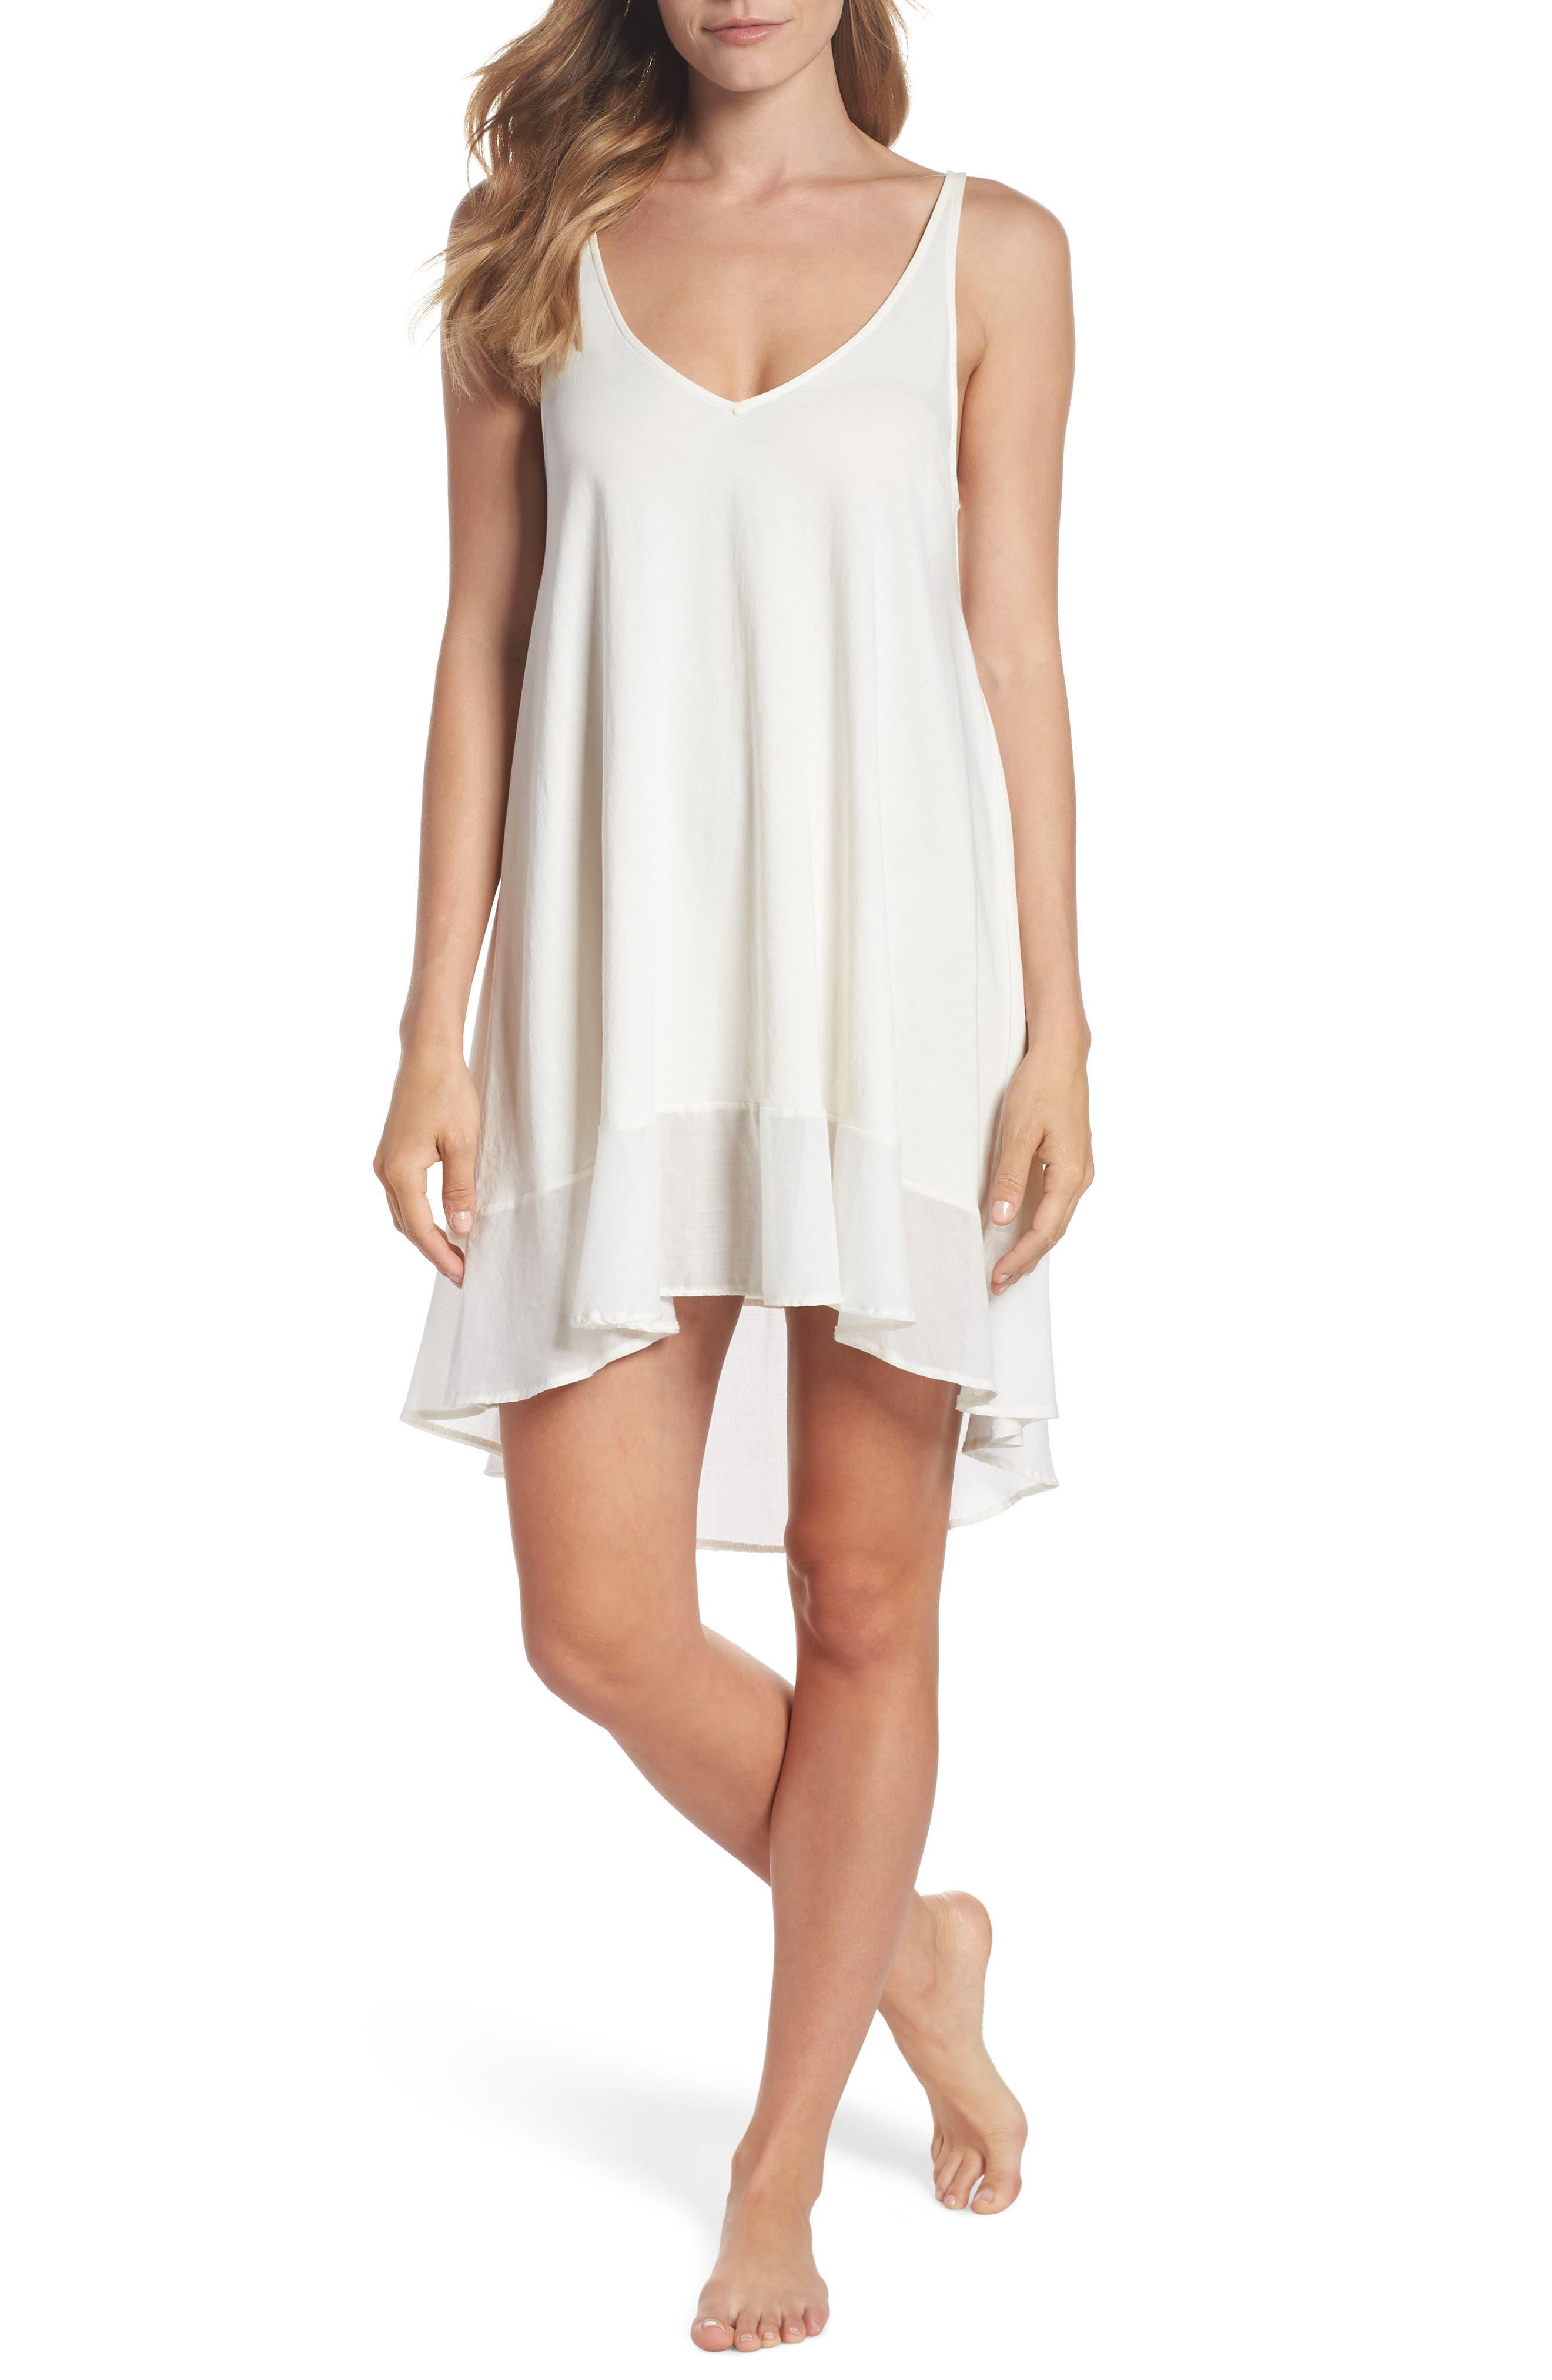 Bettina Pima Cotton Voile Nightgown,                             Main thumbnail 1, color,                             900